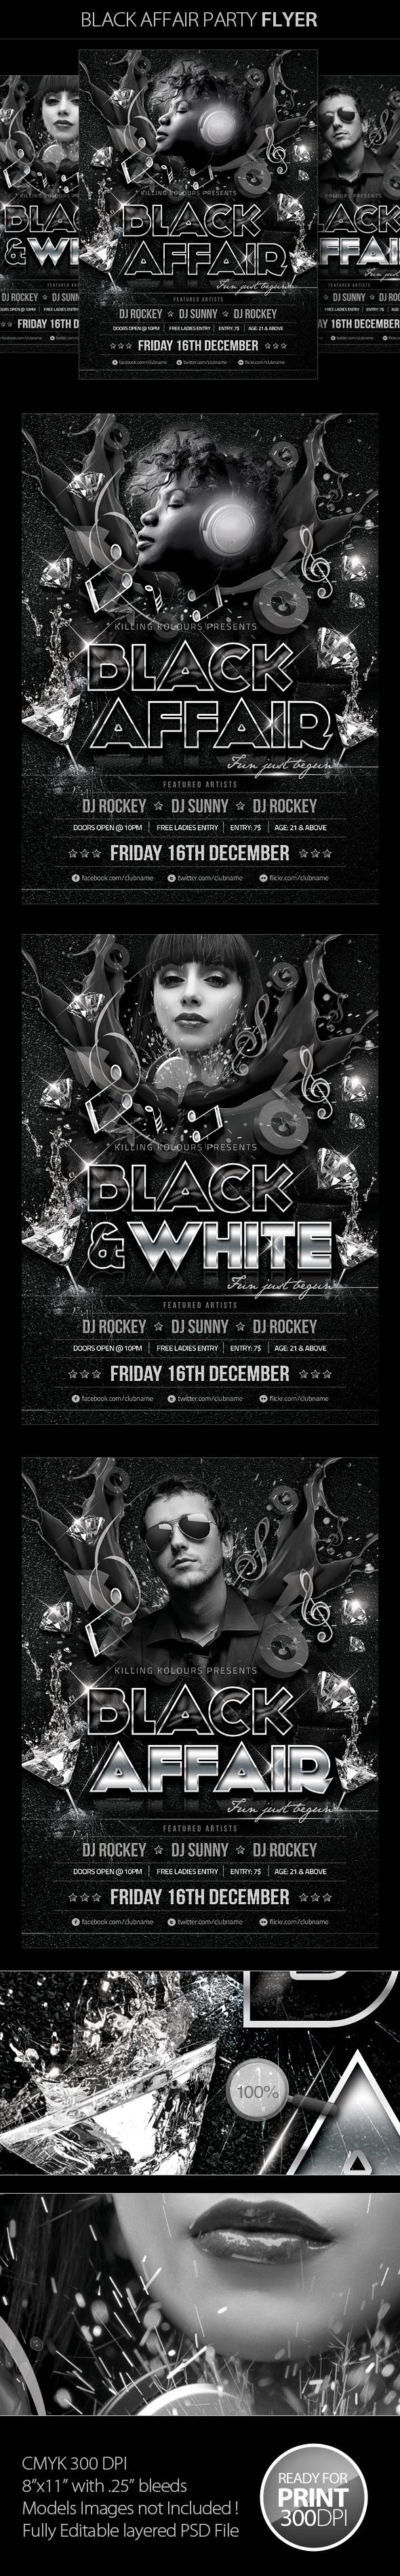 Black Affair Party Flyer by Mahantesh Nagashetty, via Behance